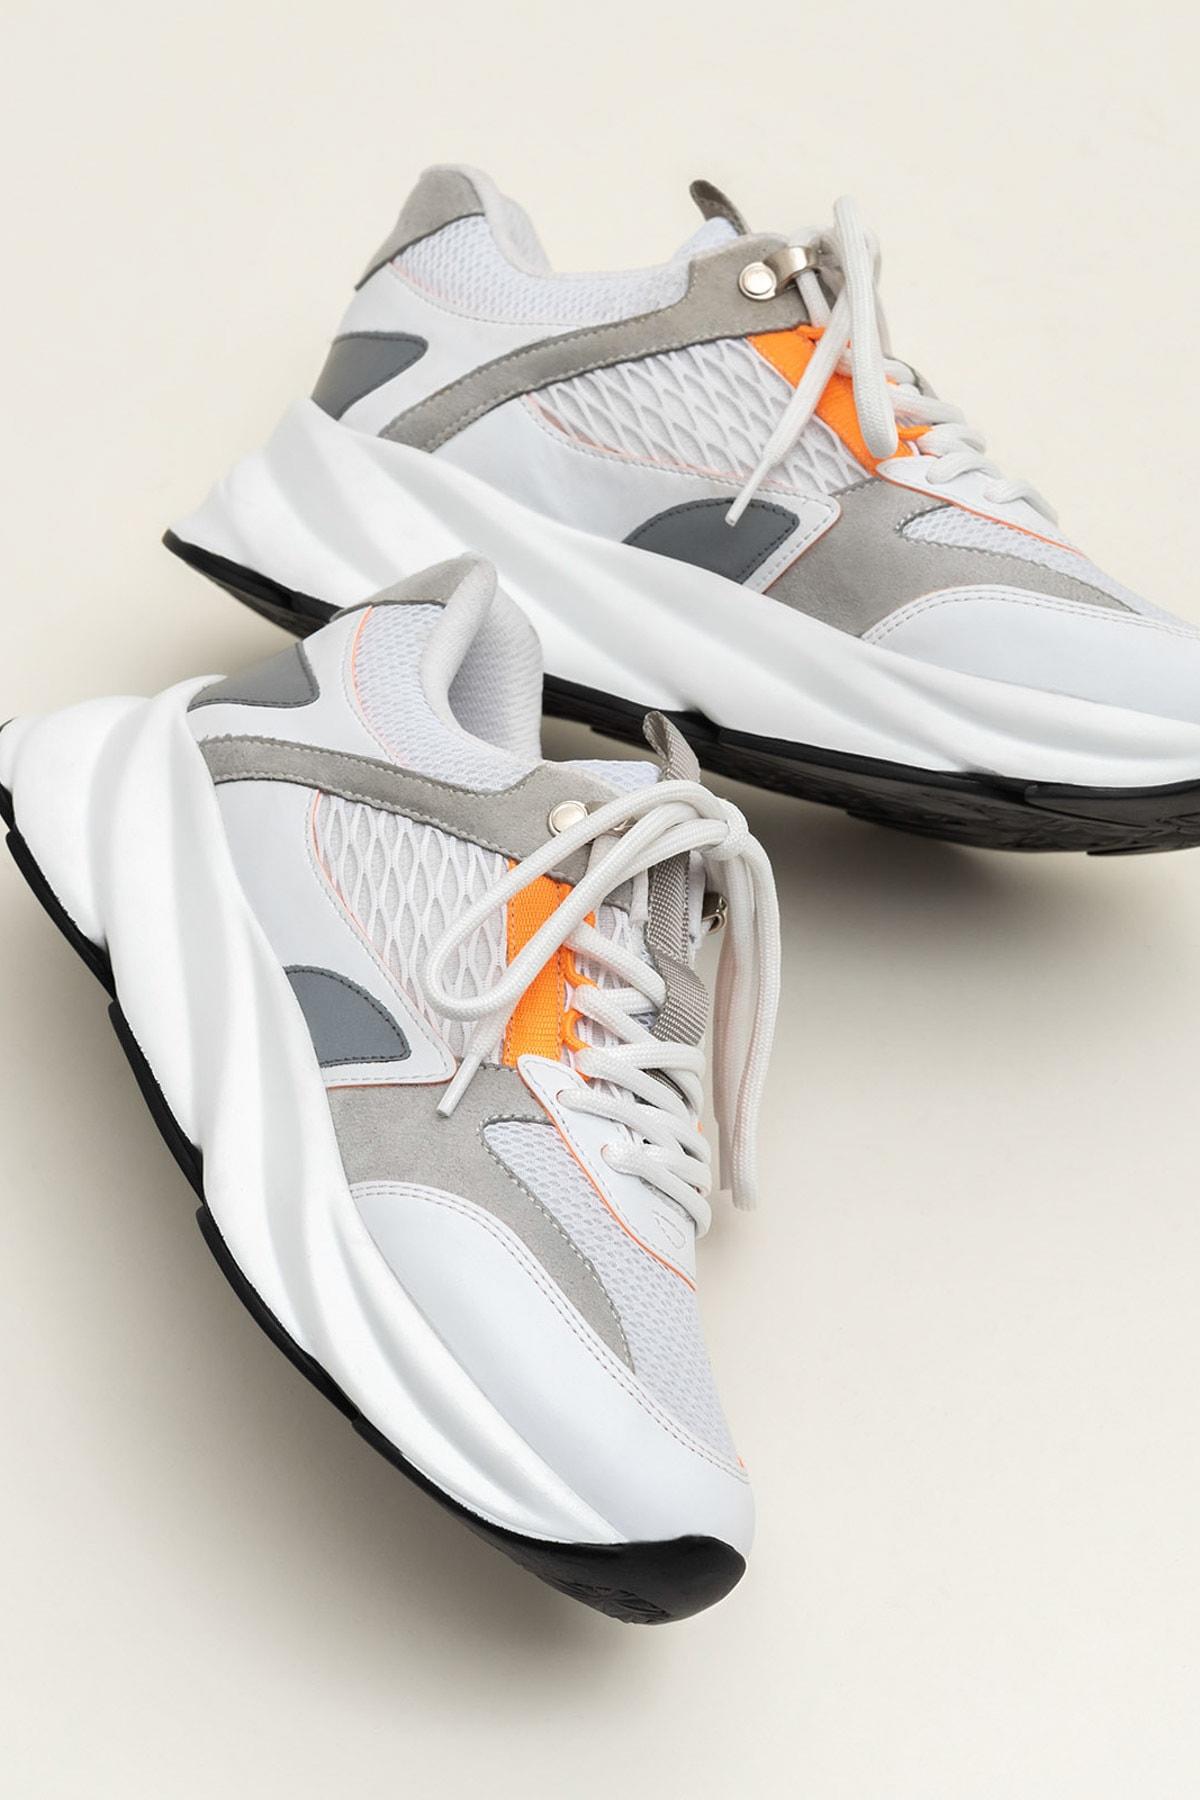 Elle Shoes ANJELA Turuncu Neon Kadın  Sneaker 20YKN5205 1